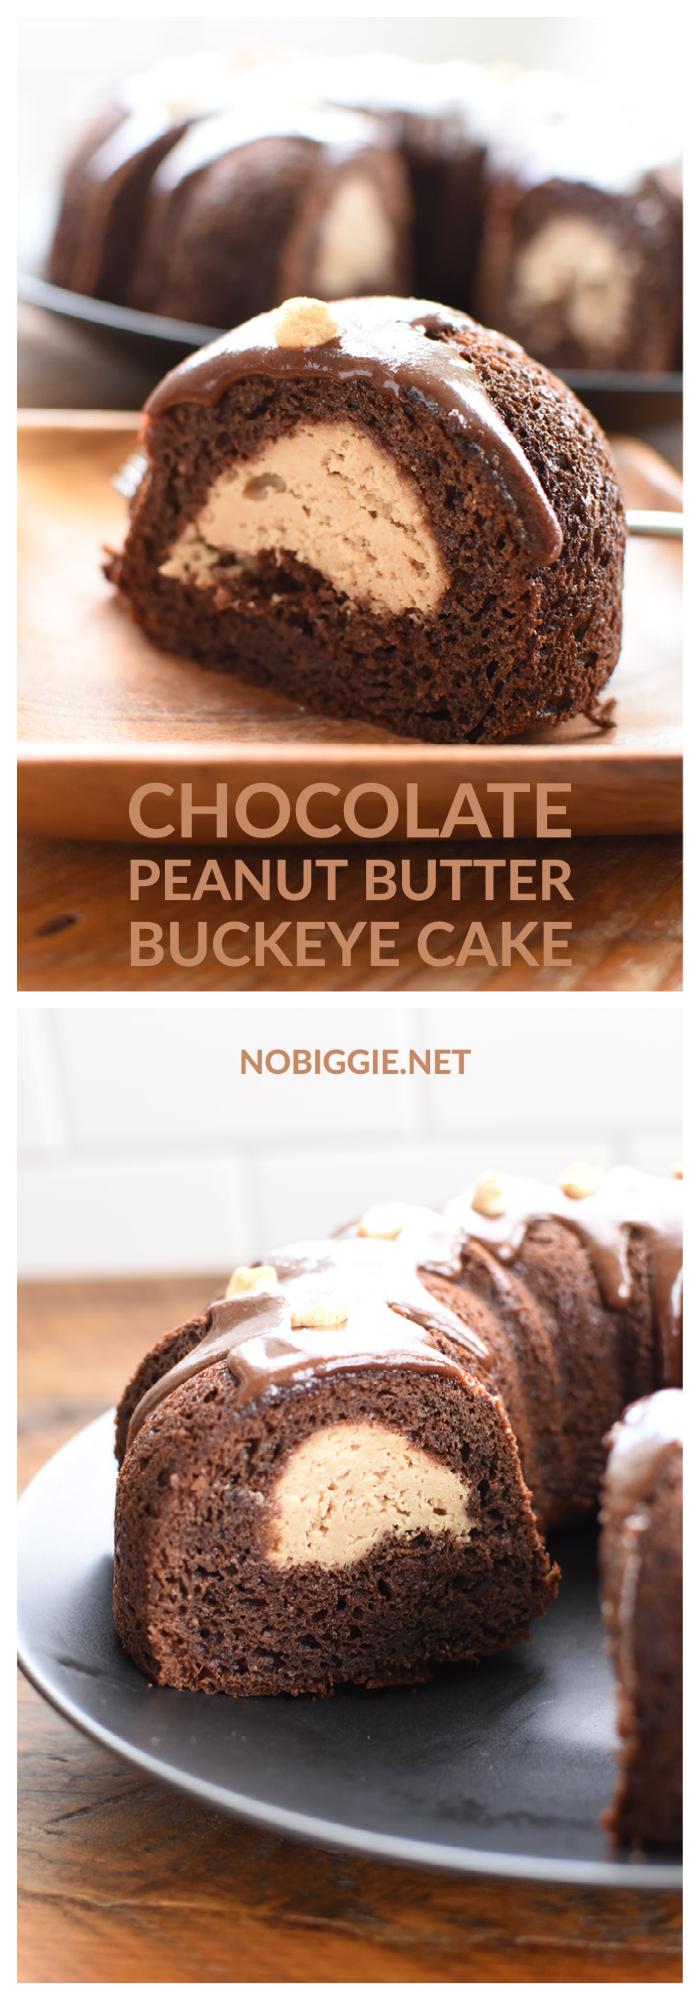 Chocolate Peanut Butter buckeye bundt cake | NoBiggie.net